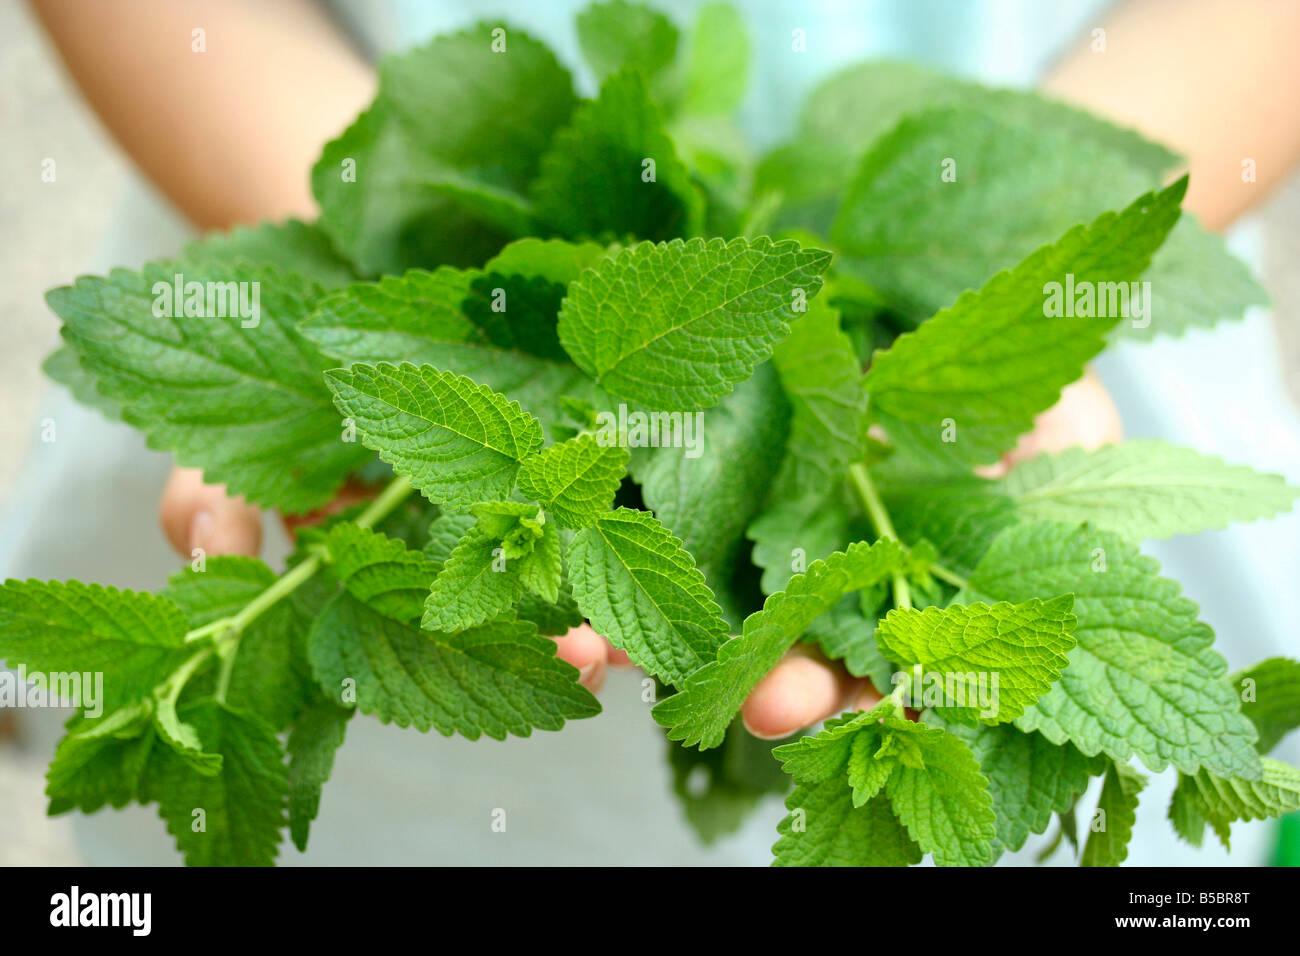 Lemon balm Melissa officinalis - Stock Image